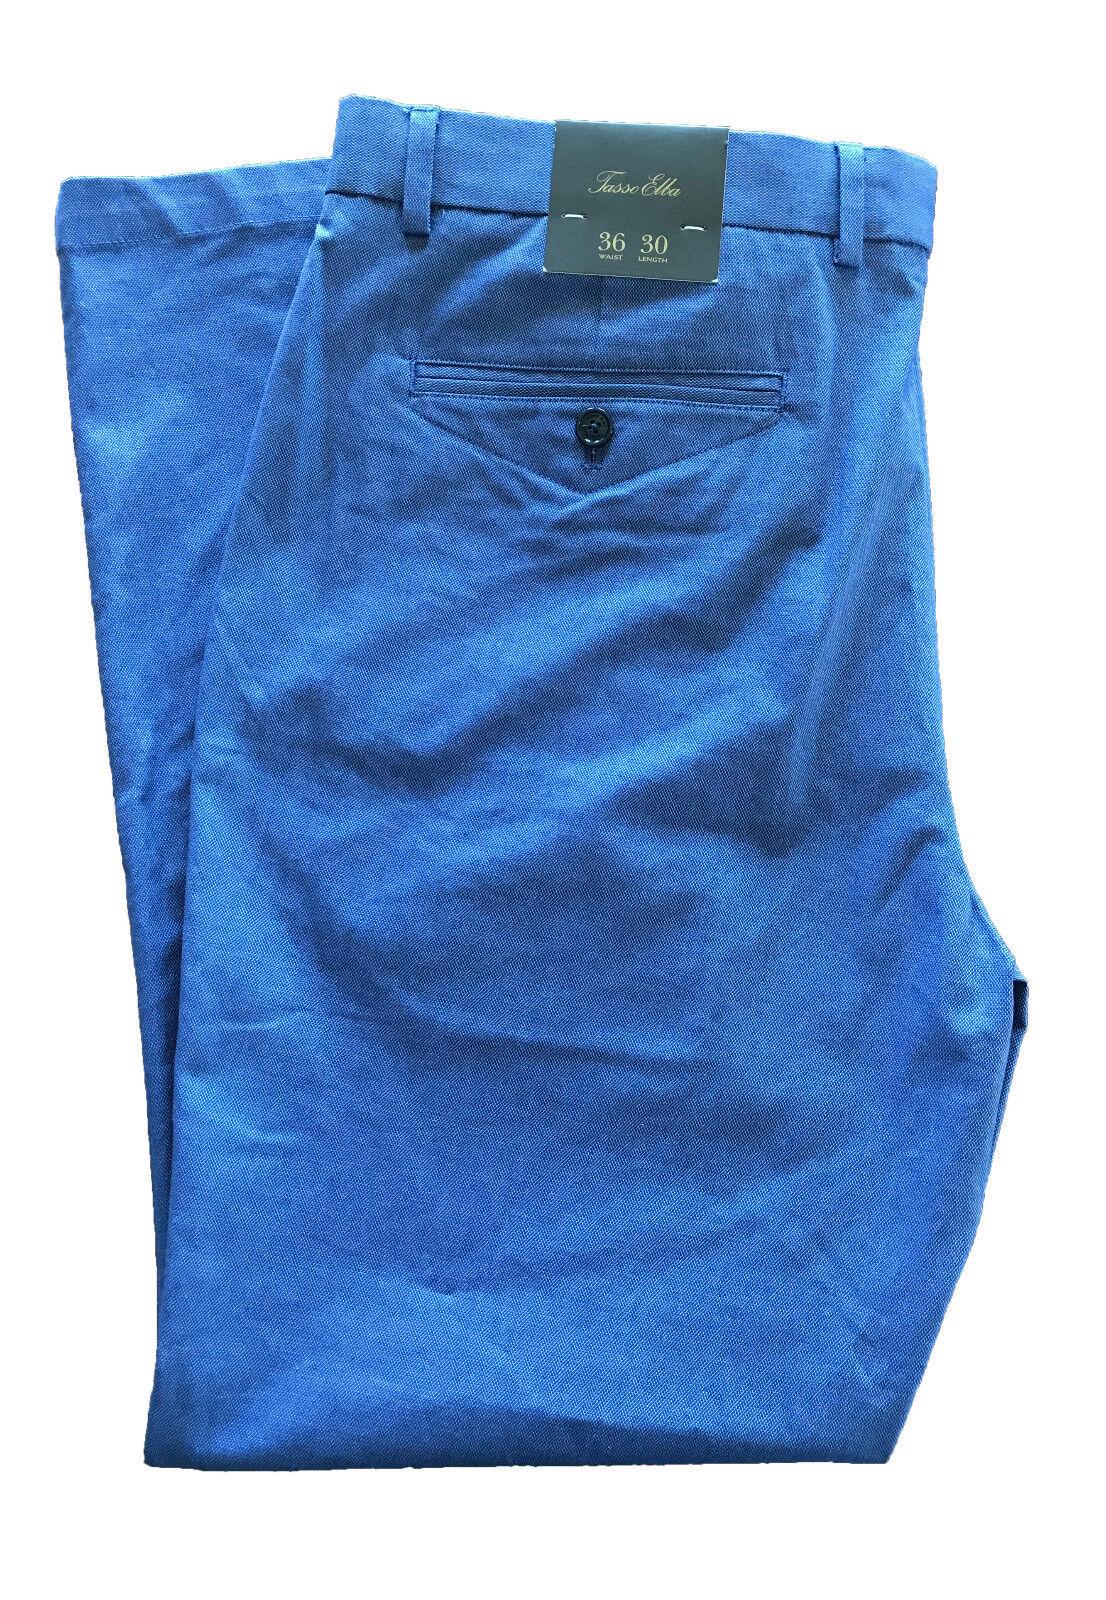 Tasso Elba Mens bluee Classic-Fit Stretch Pants 36x30